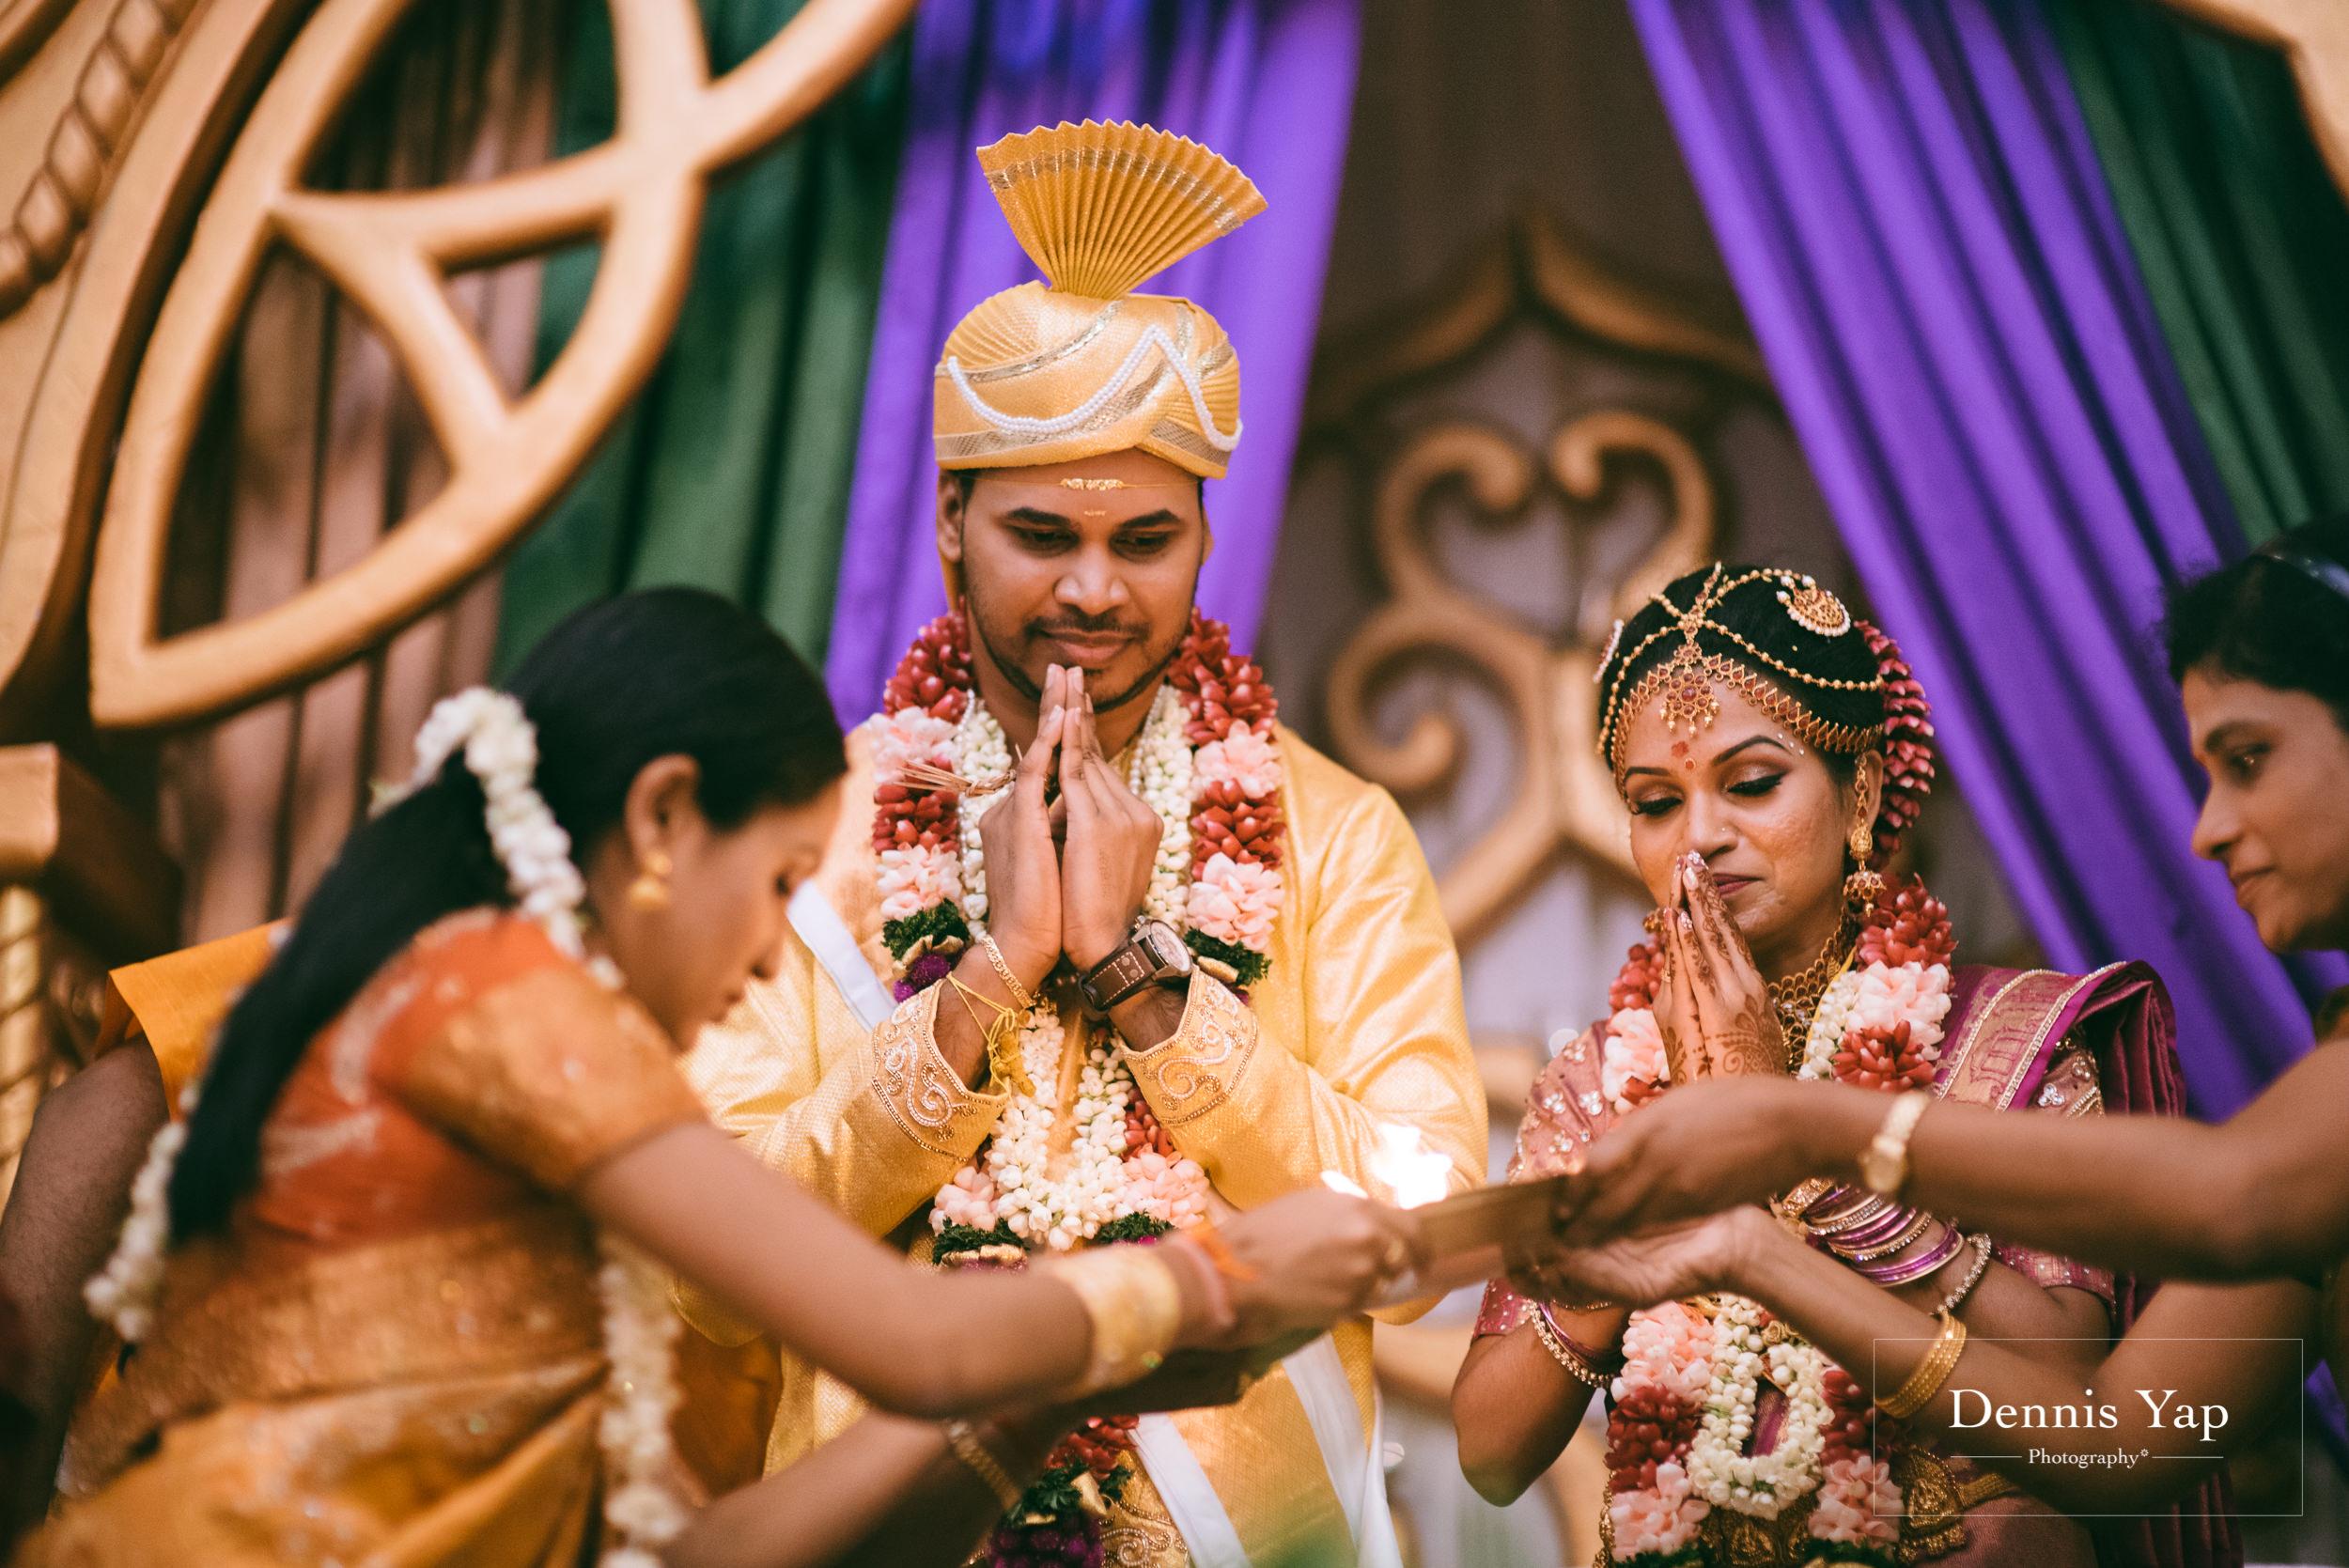 puvaneswaran cangitaa indian wedding ceremony ideal convention dennis yap photography malaysia-32.jpg